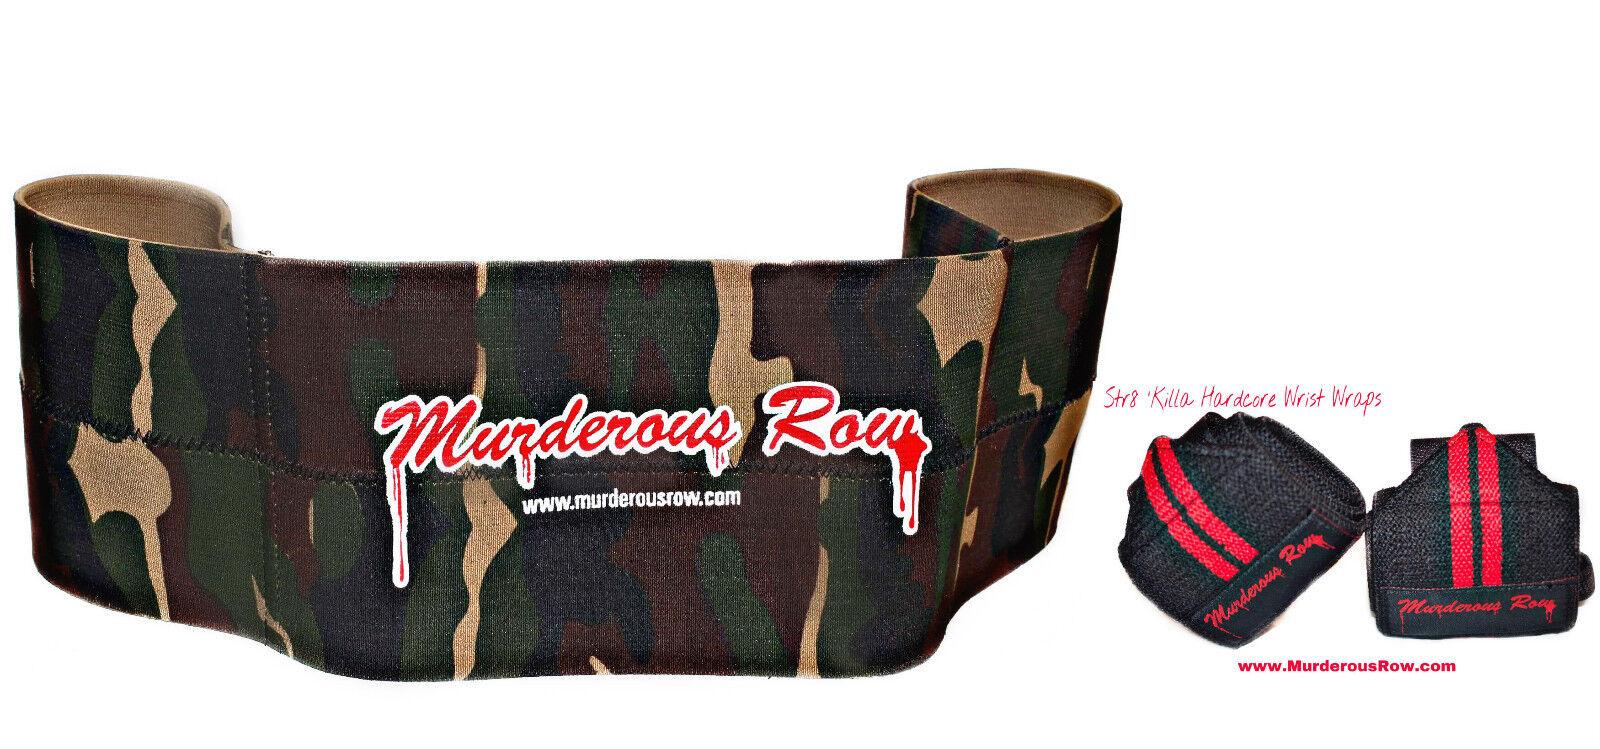 MURDEROUS ROW Bench Press Sling  Shot (XL) DESERT STORM + Str8 Killa Wrist Wraps  wholesale price and reliable quality